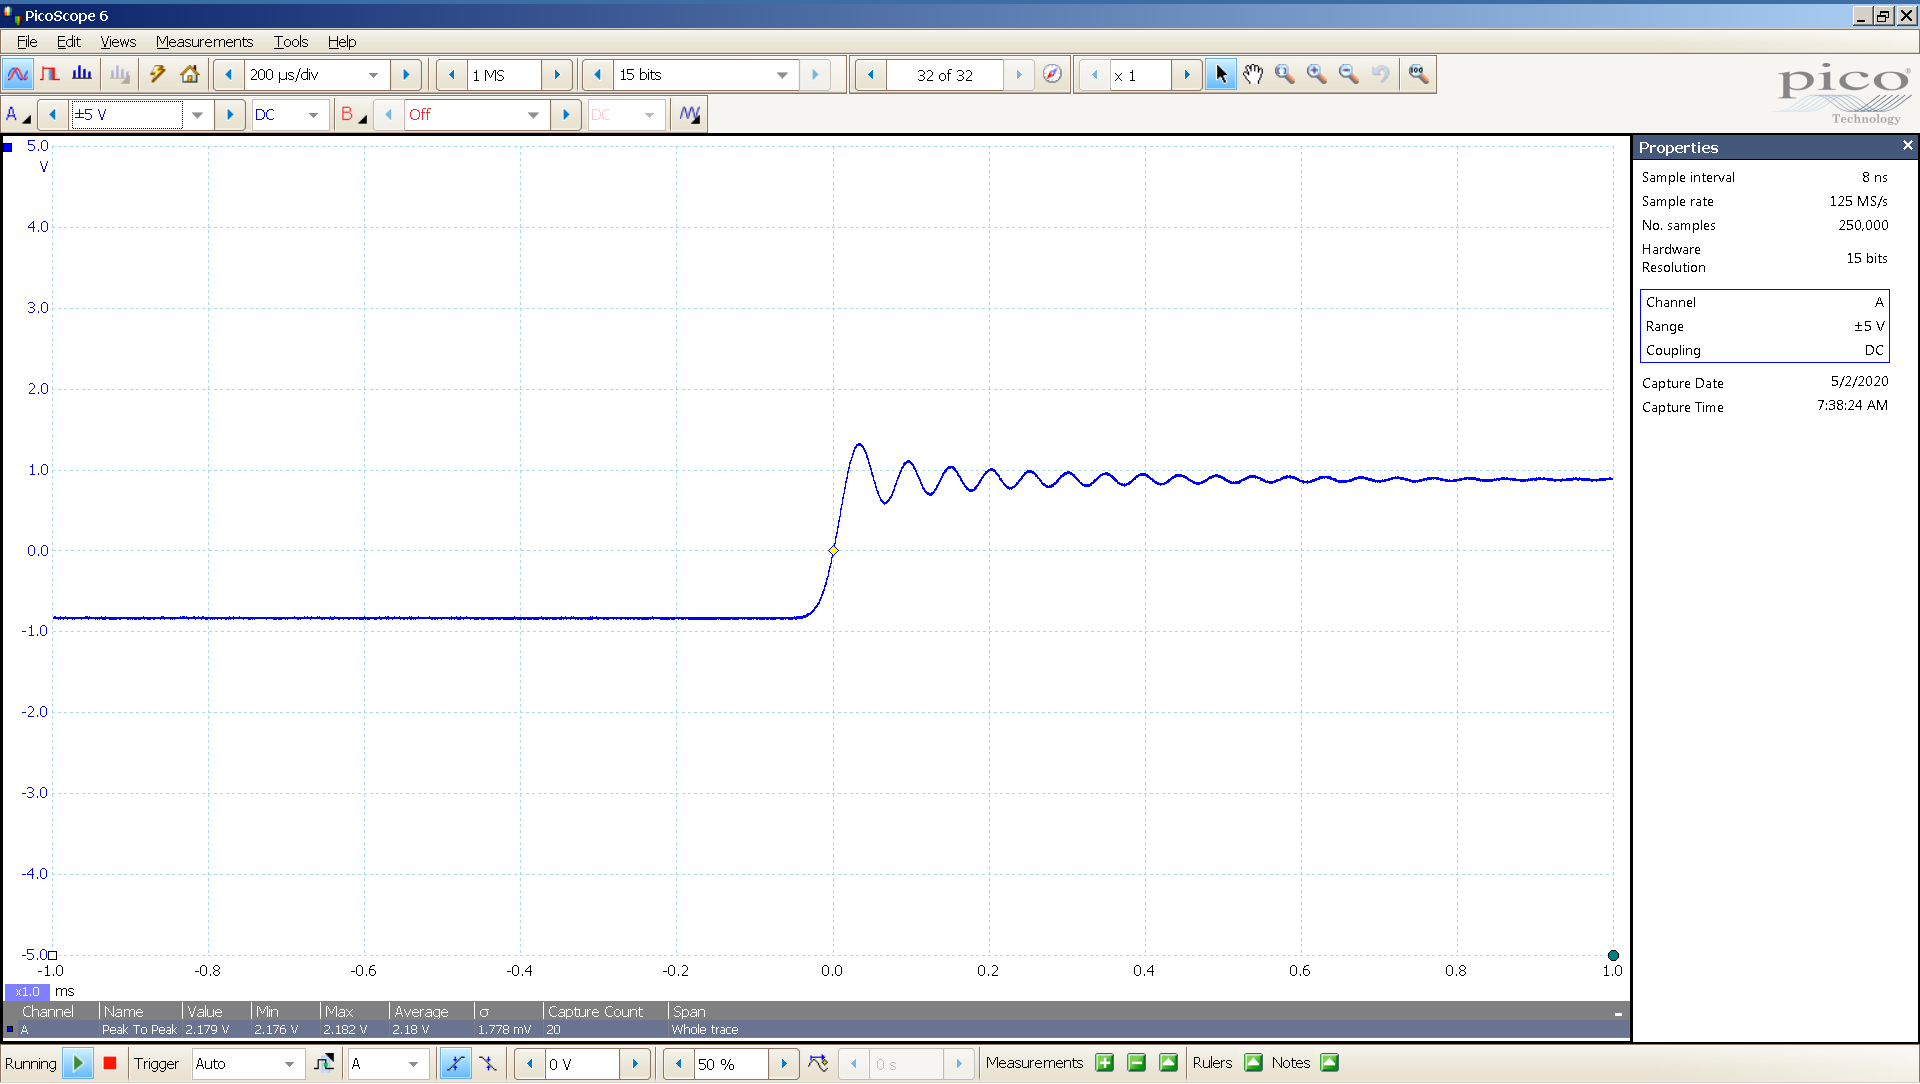 20200502-08 KTE Spring2 20 Hz sqr -4 dBFS 2 Vpp 200uS div SE - ASIO - OS DSD.png